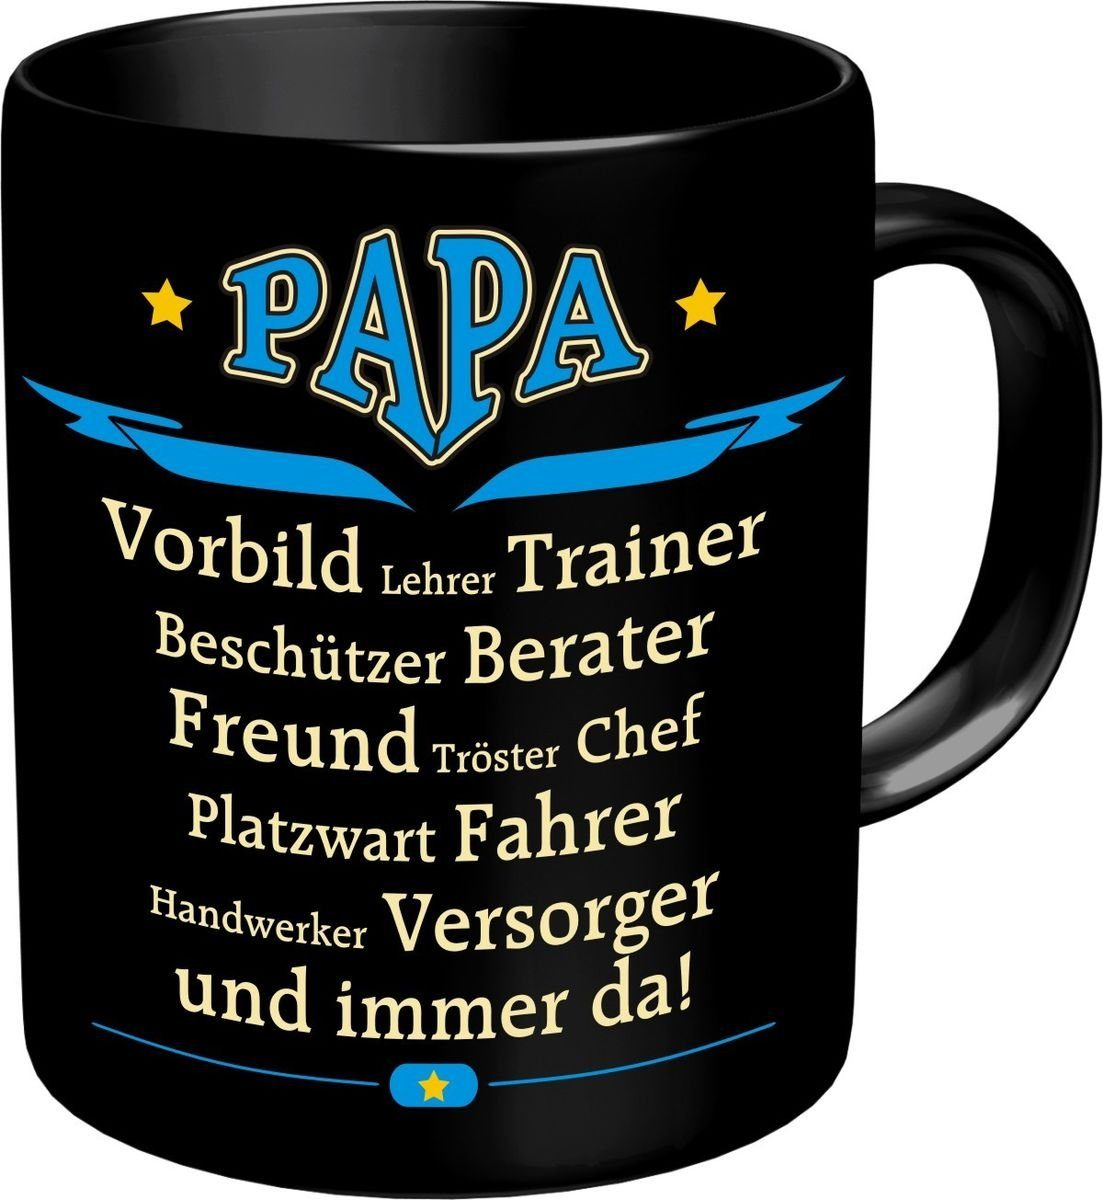 Rahmenlos Tasse mit tollem Papa-Druck